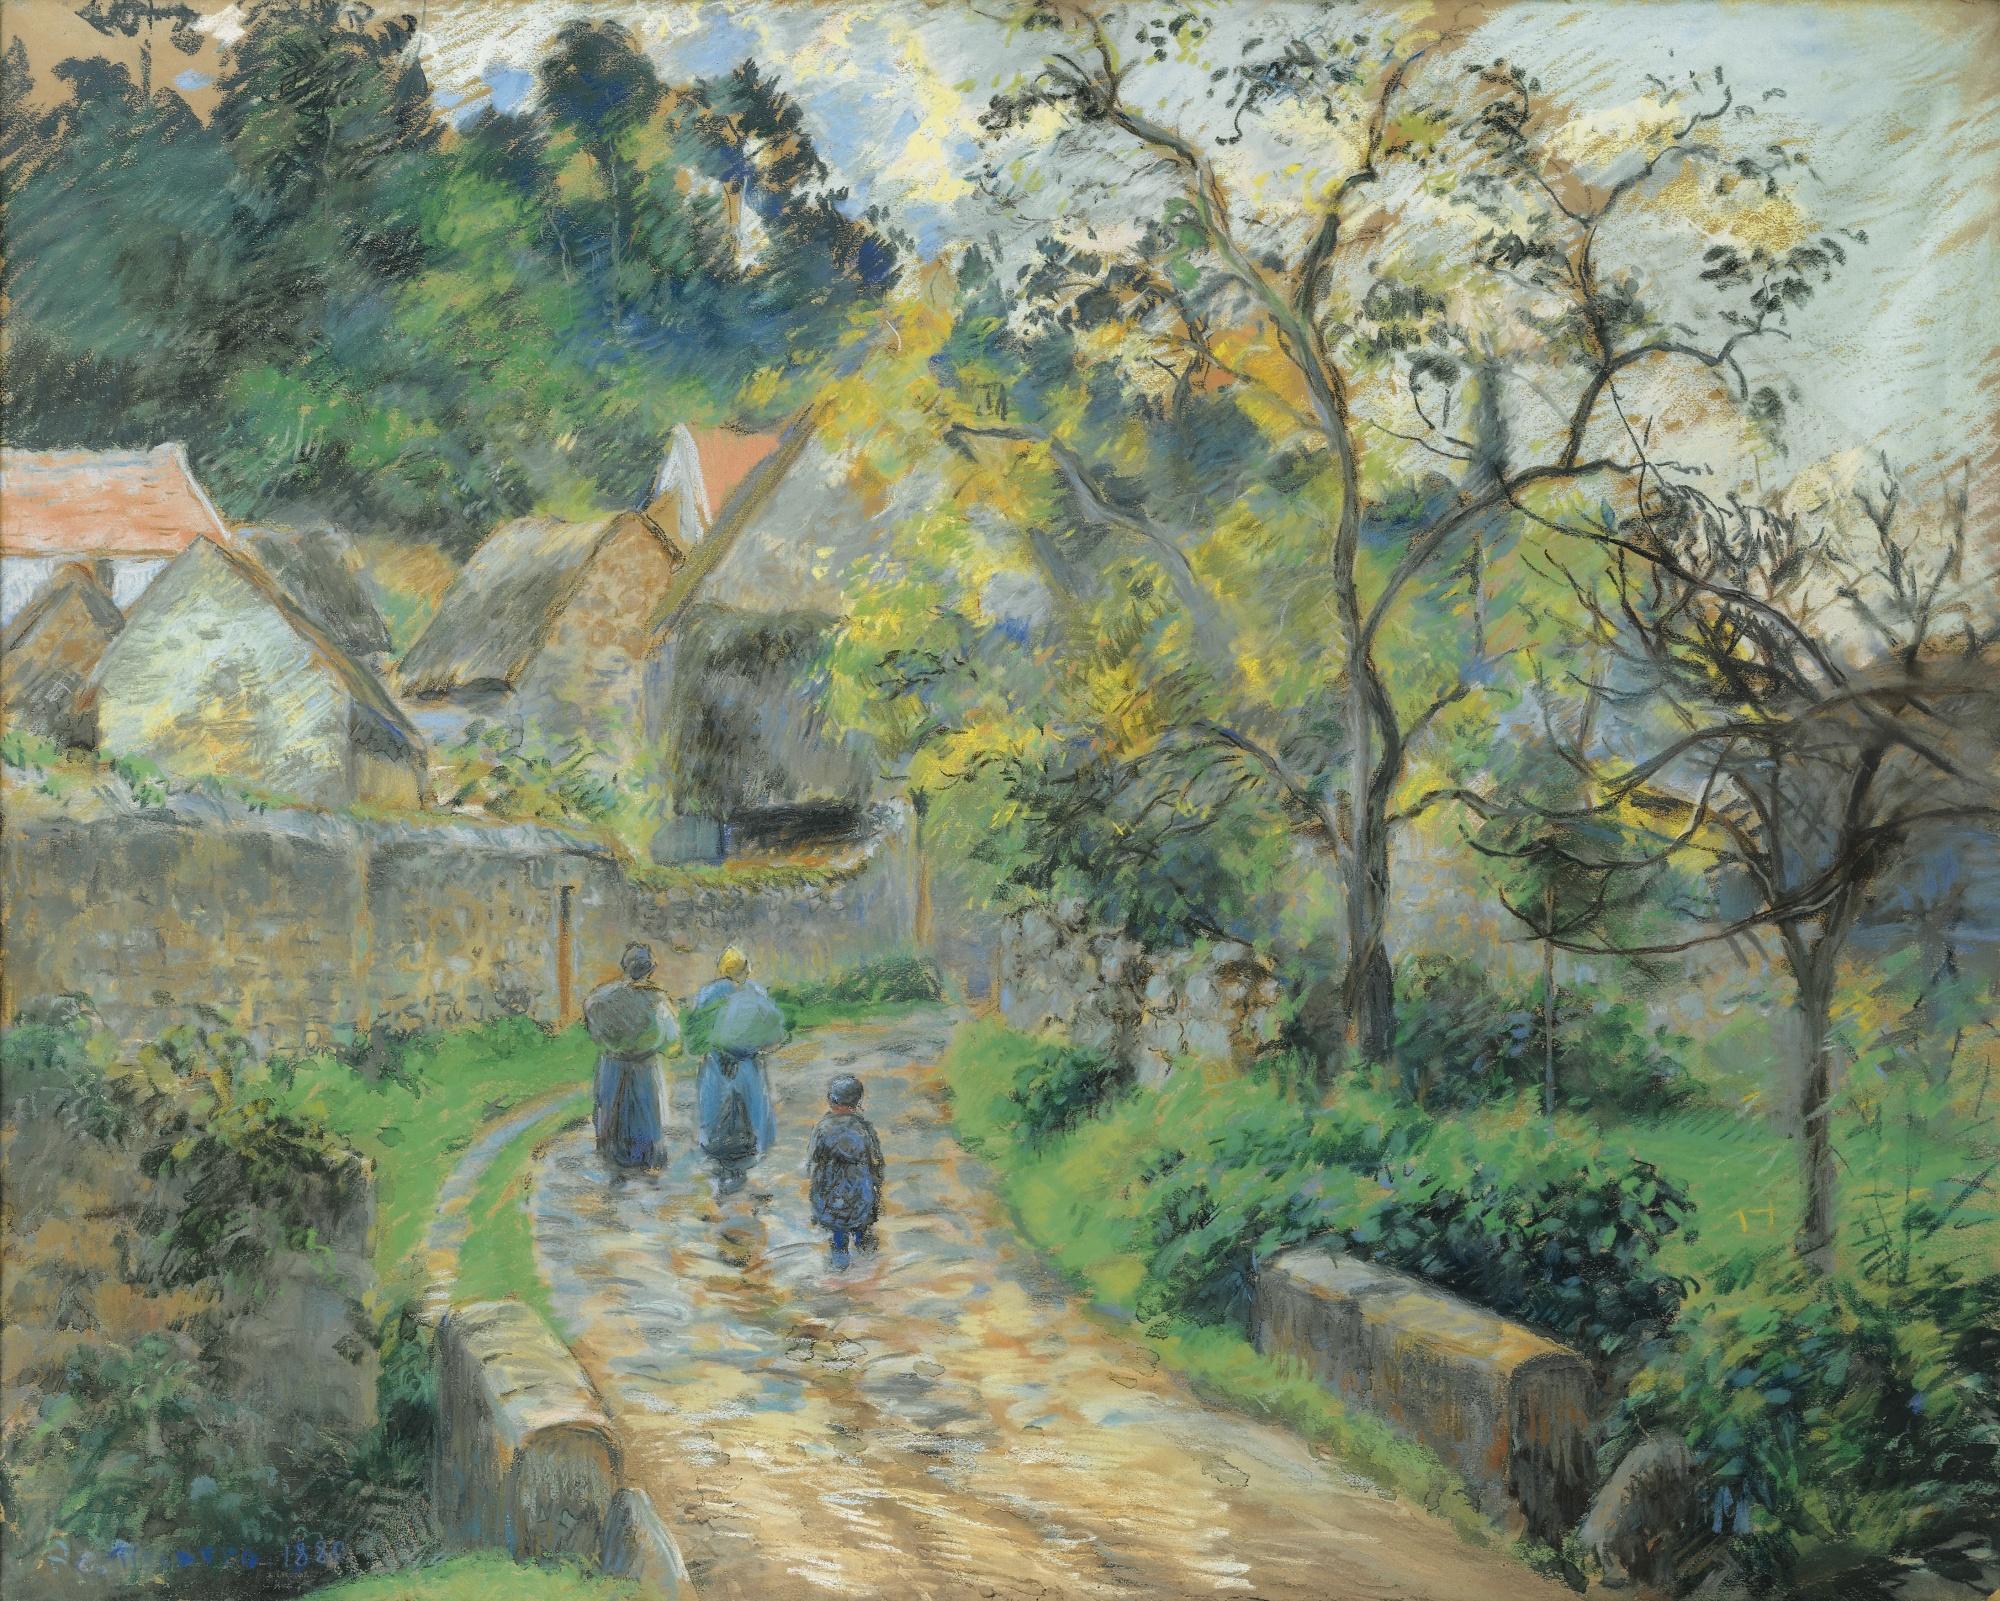 Camille Pissarro-Rue De Village A Auvers-1880